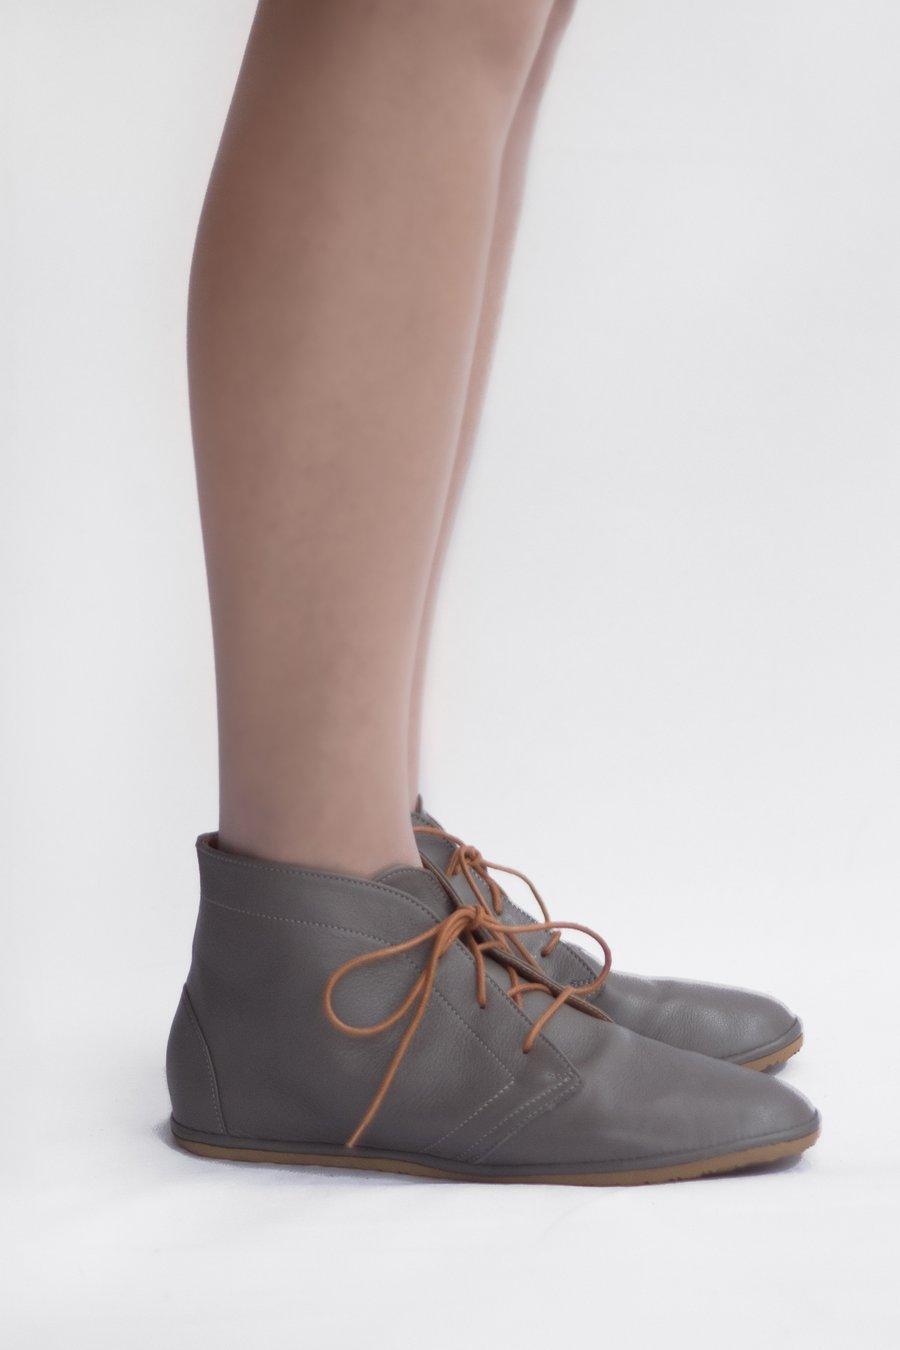 Image of Desert boots - Leona in Grey